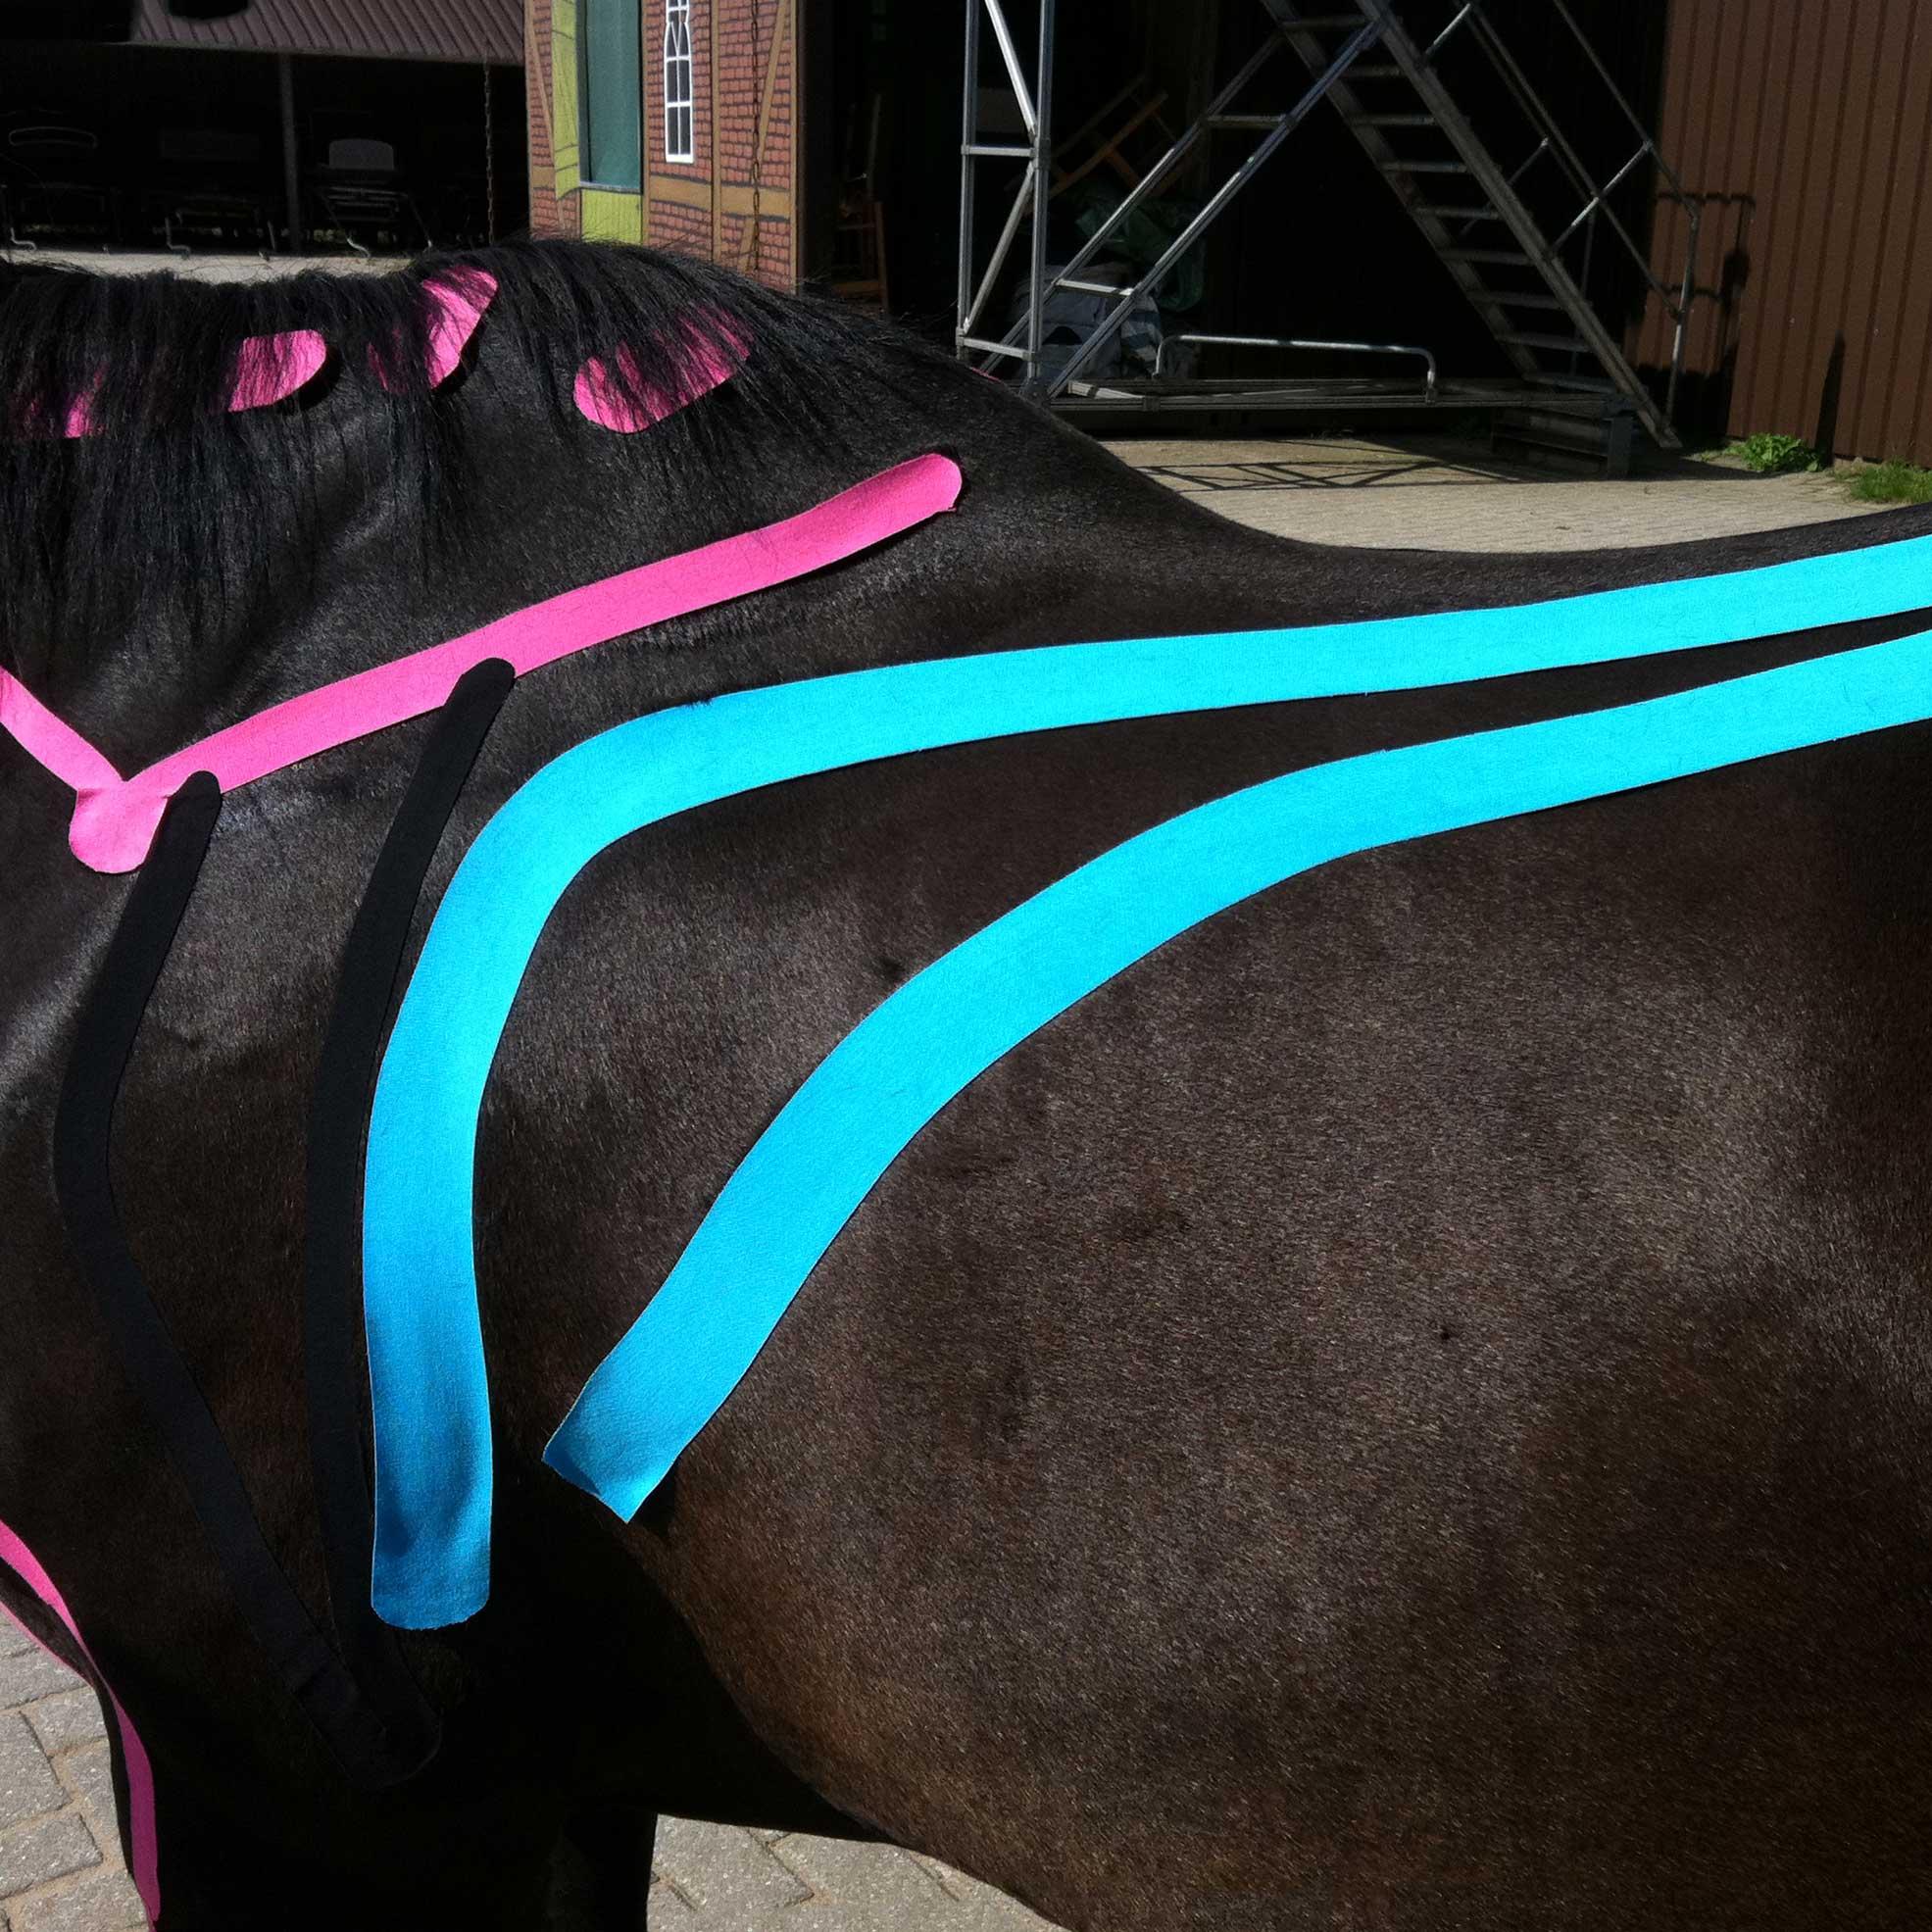 Pferdetherapie Richelmann – Die Pferde-Osteopathen: EquiK-Taping